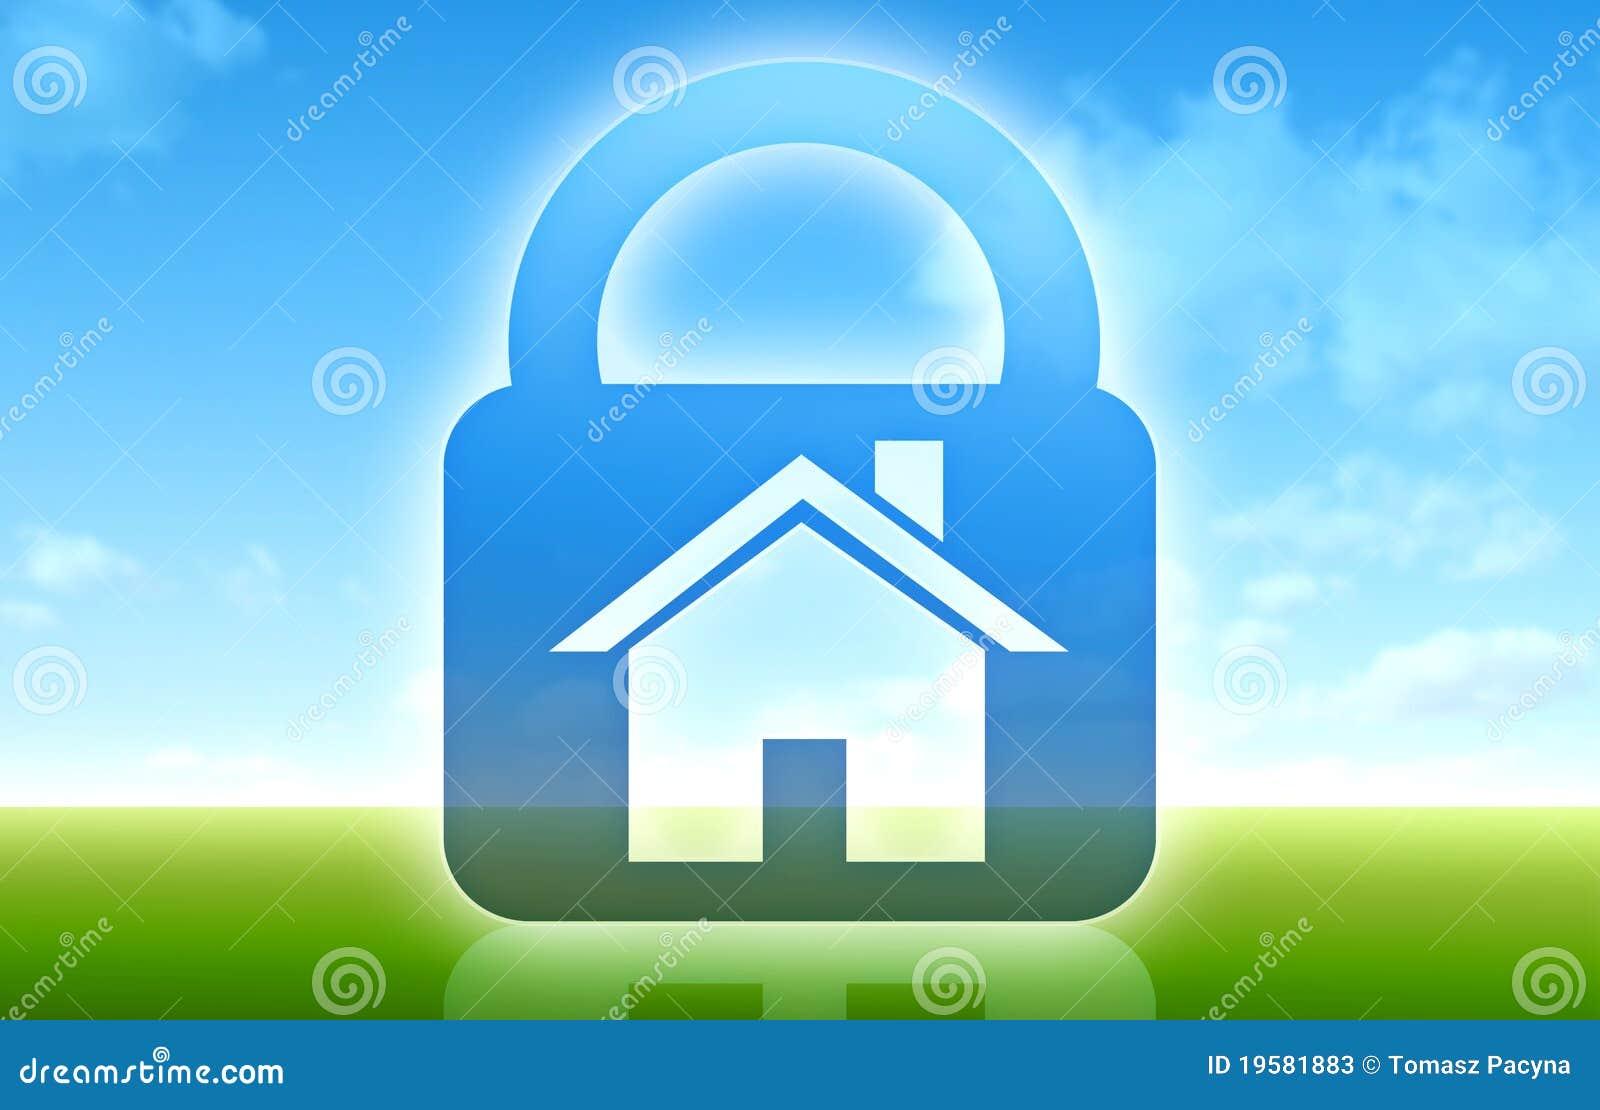 Safe house concept